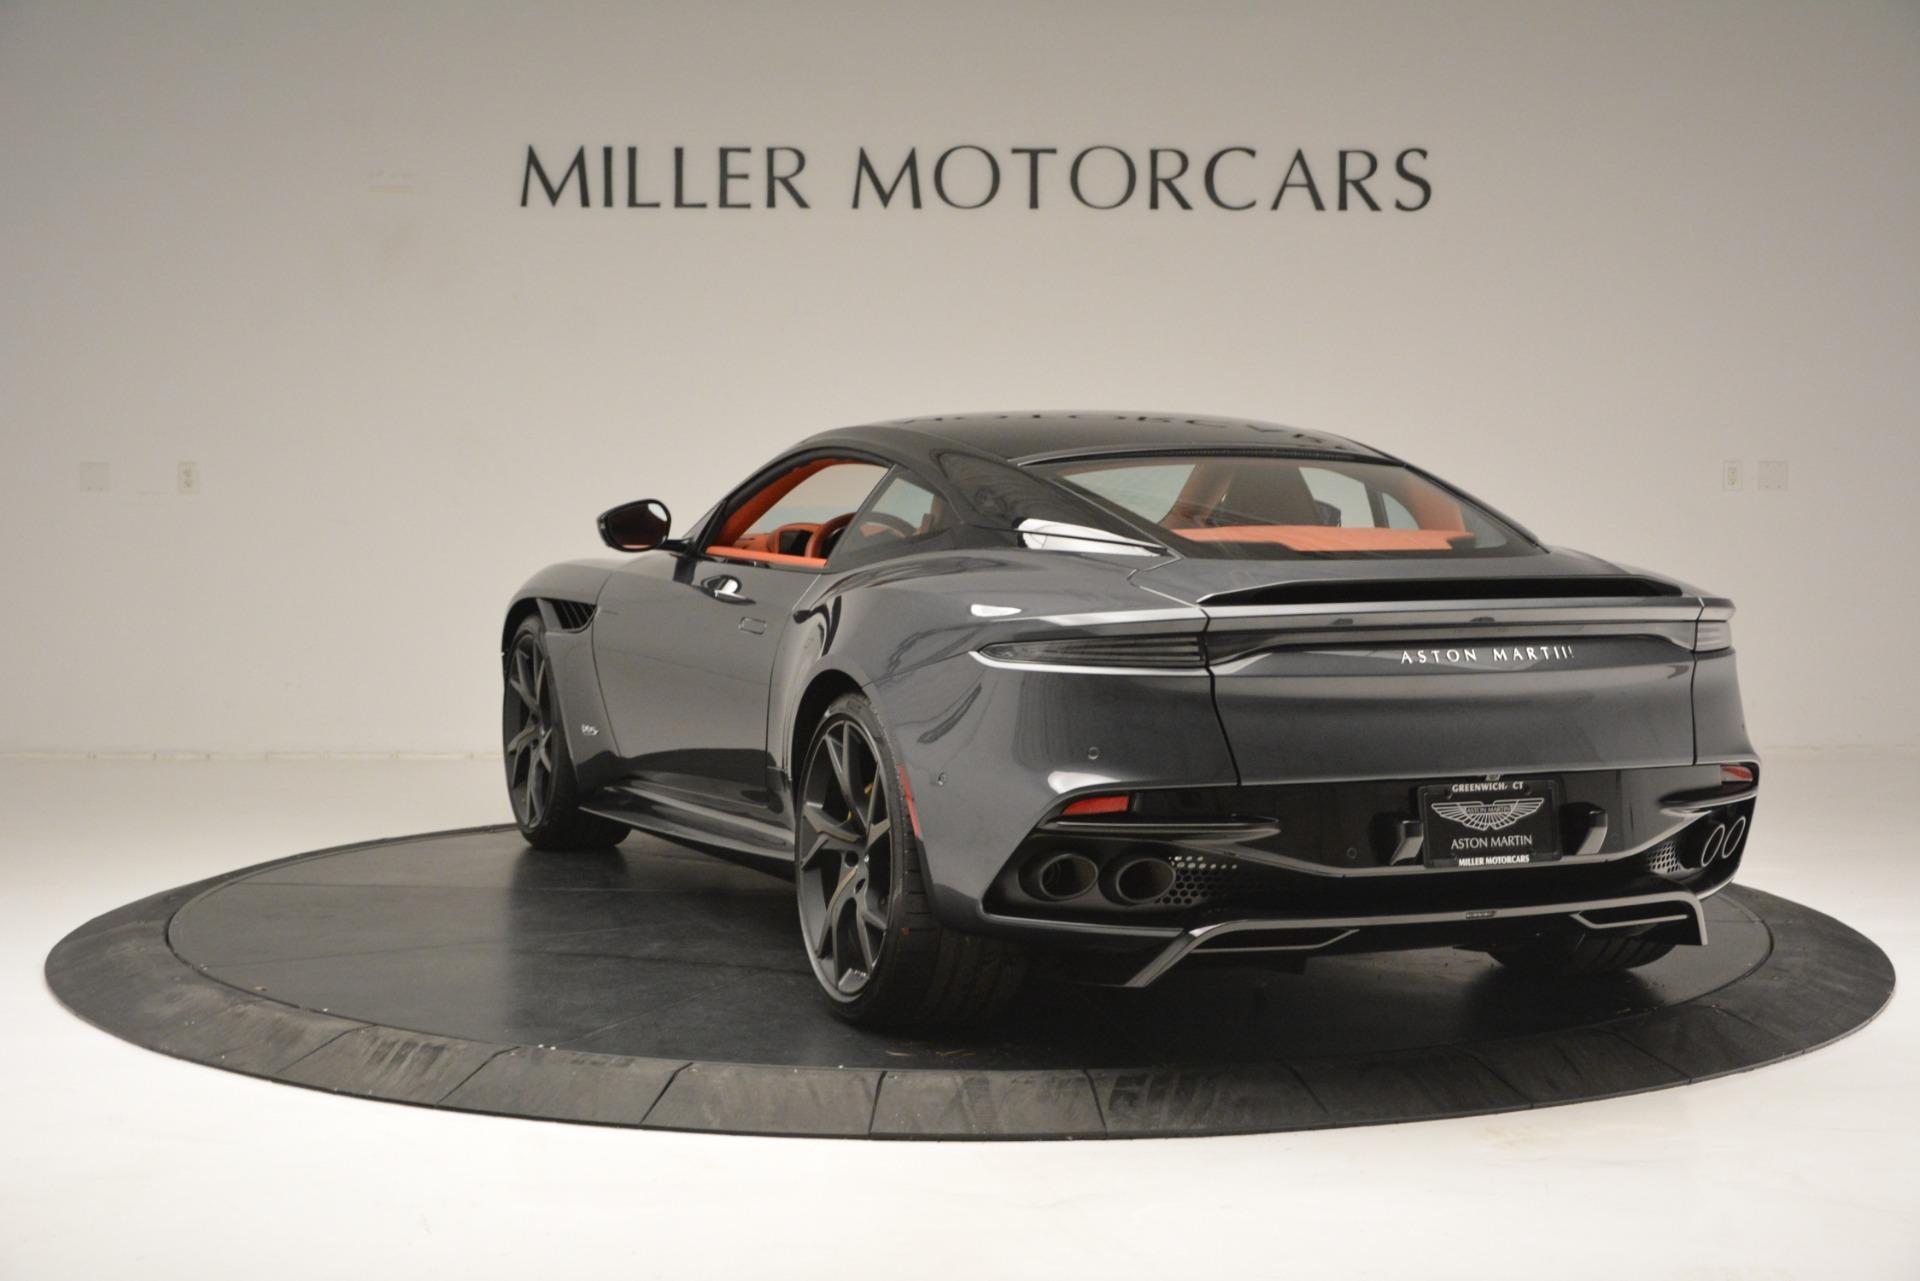 New 2019 Aston Martin DBS Superleggera